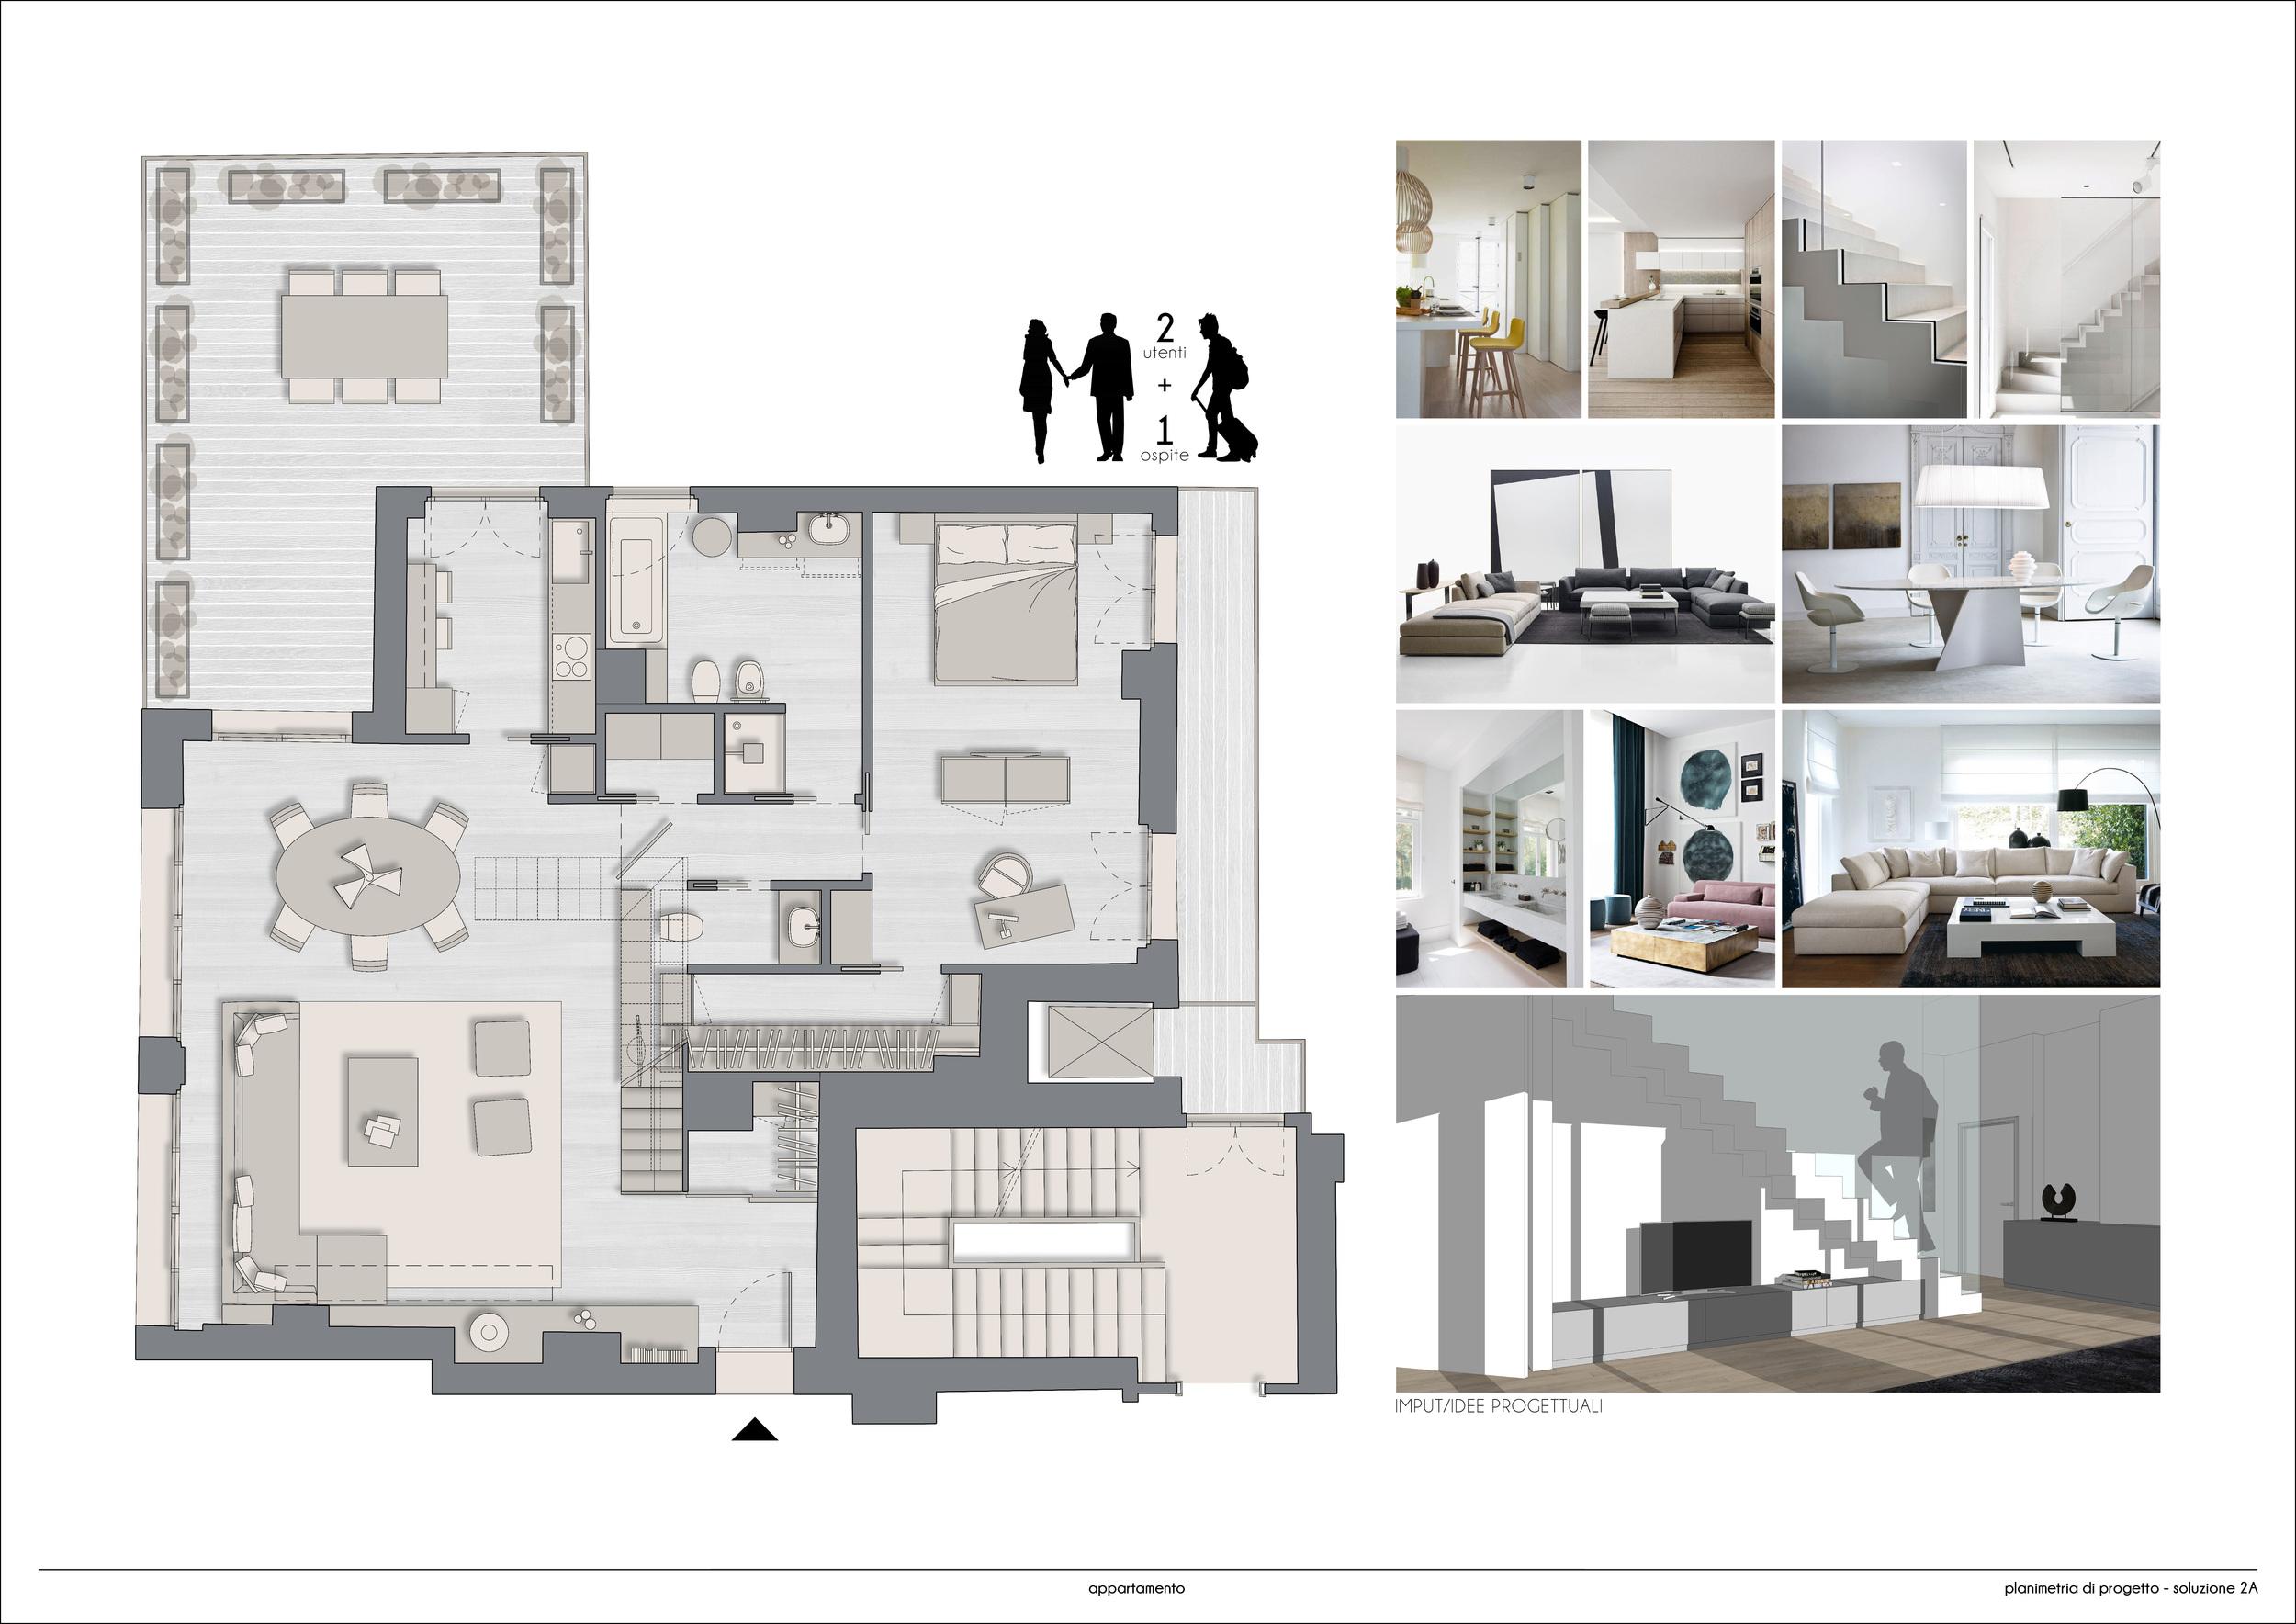 proposta 3.jpg